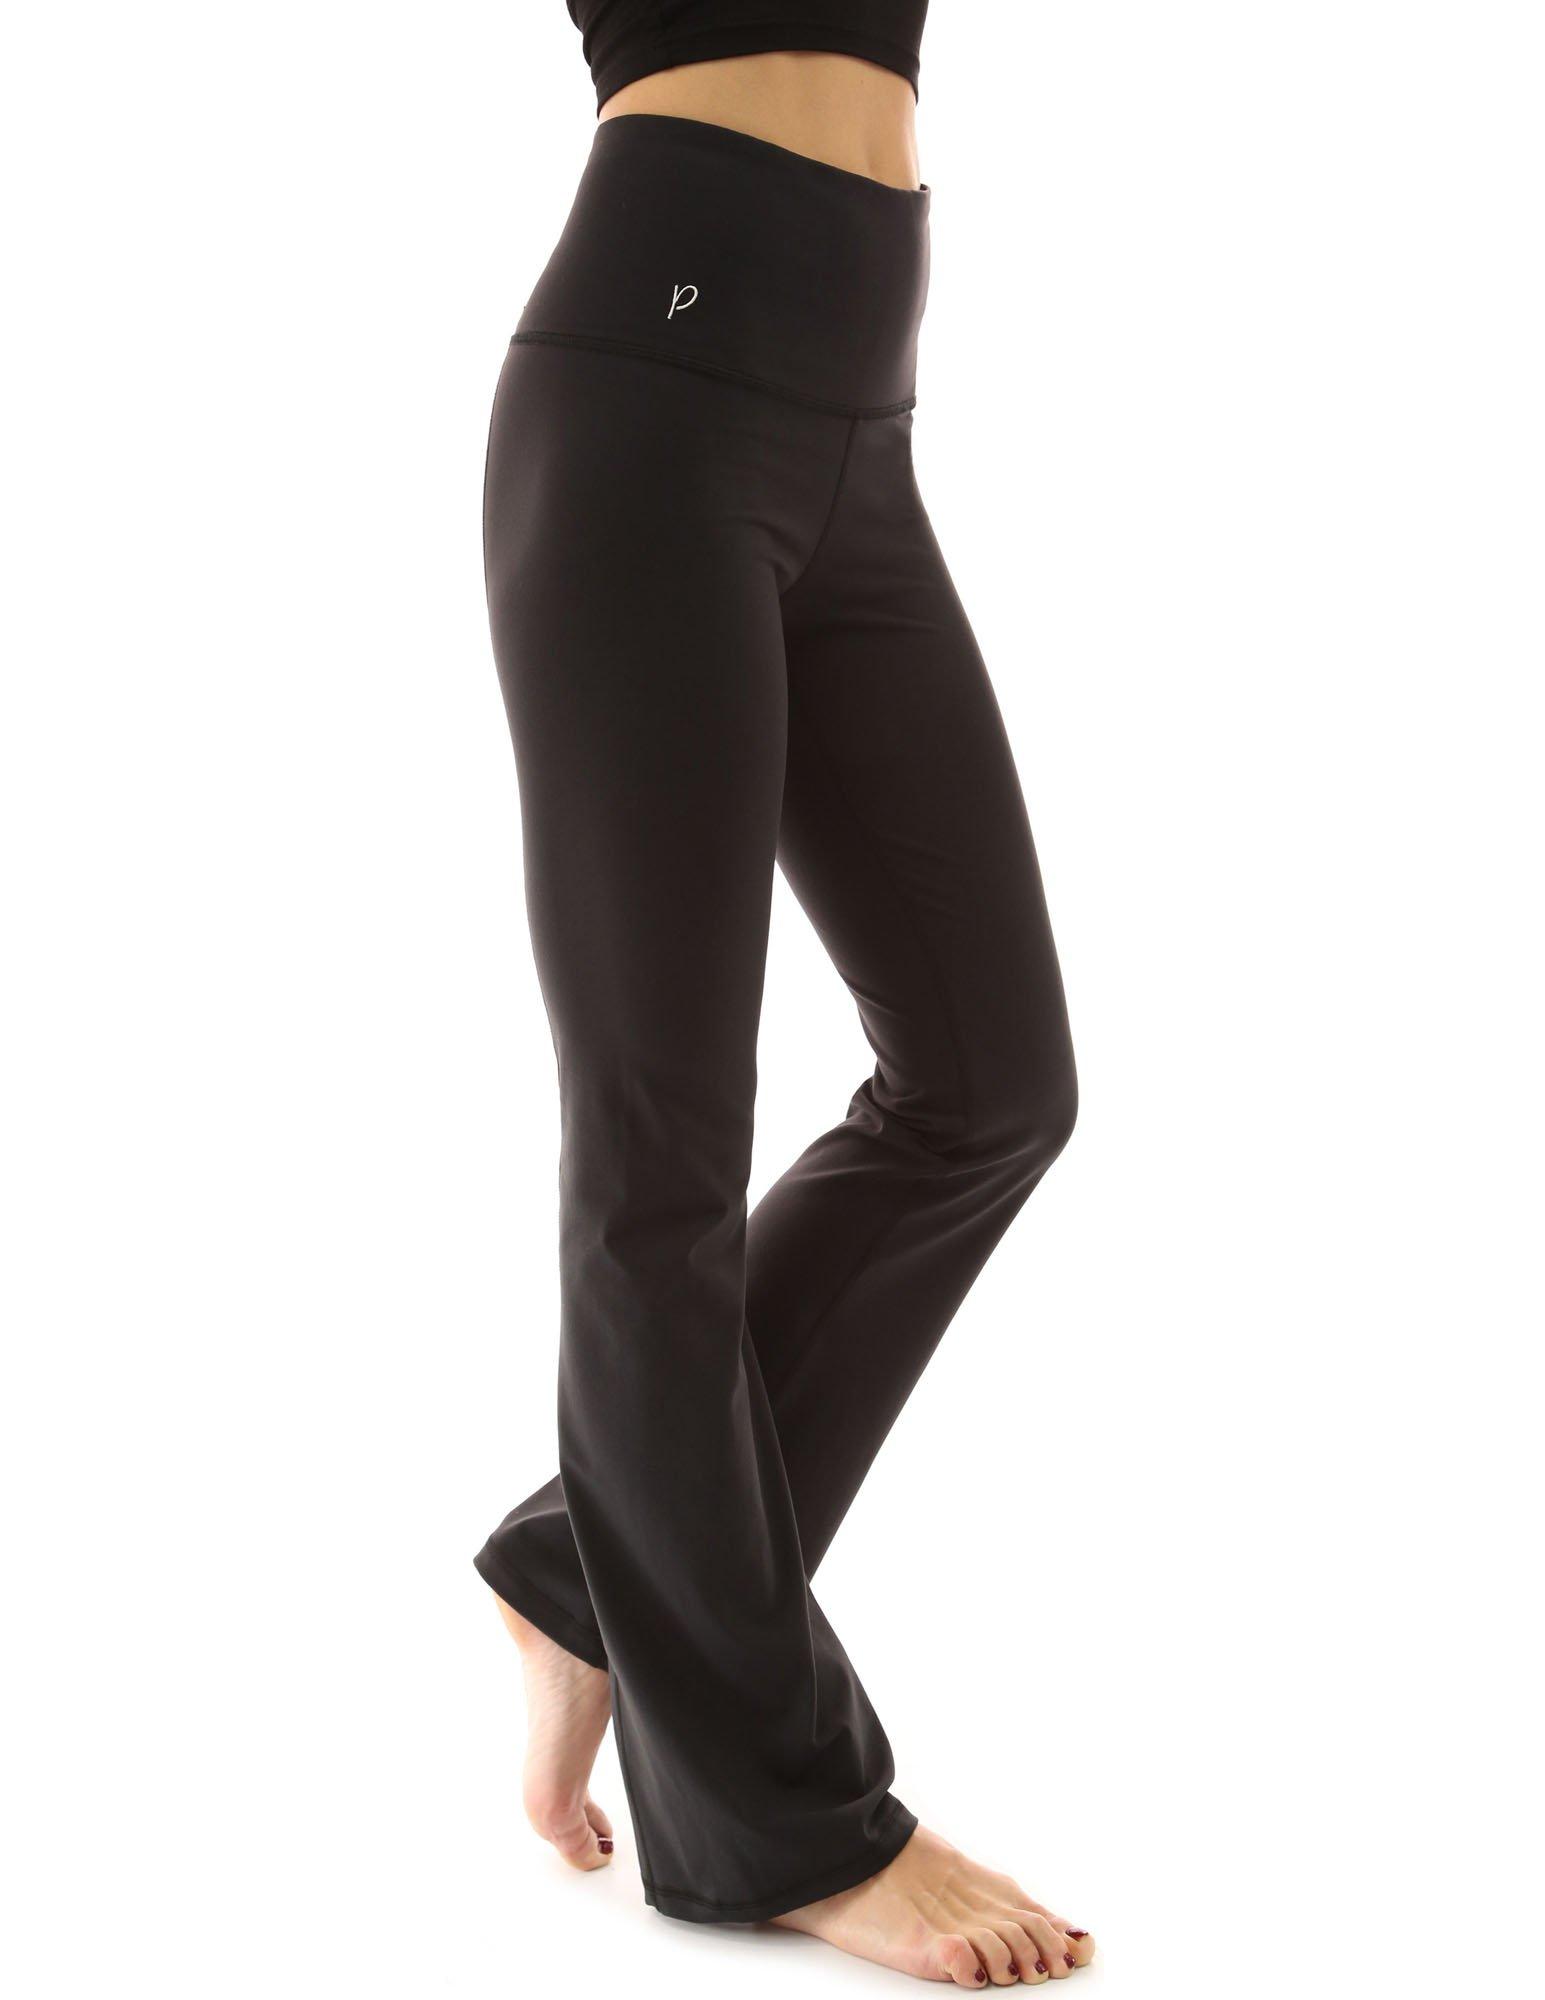 PattyBoutik Women Shaping Series Bootcut Yoga Pants (Solid Black XL) by PattyBoutik